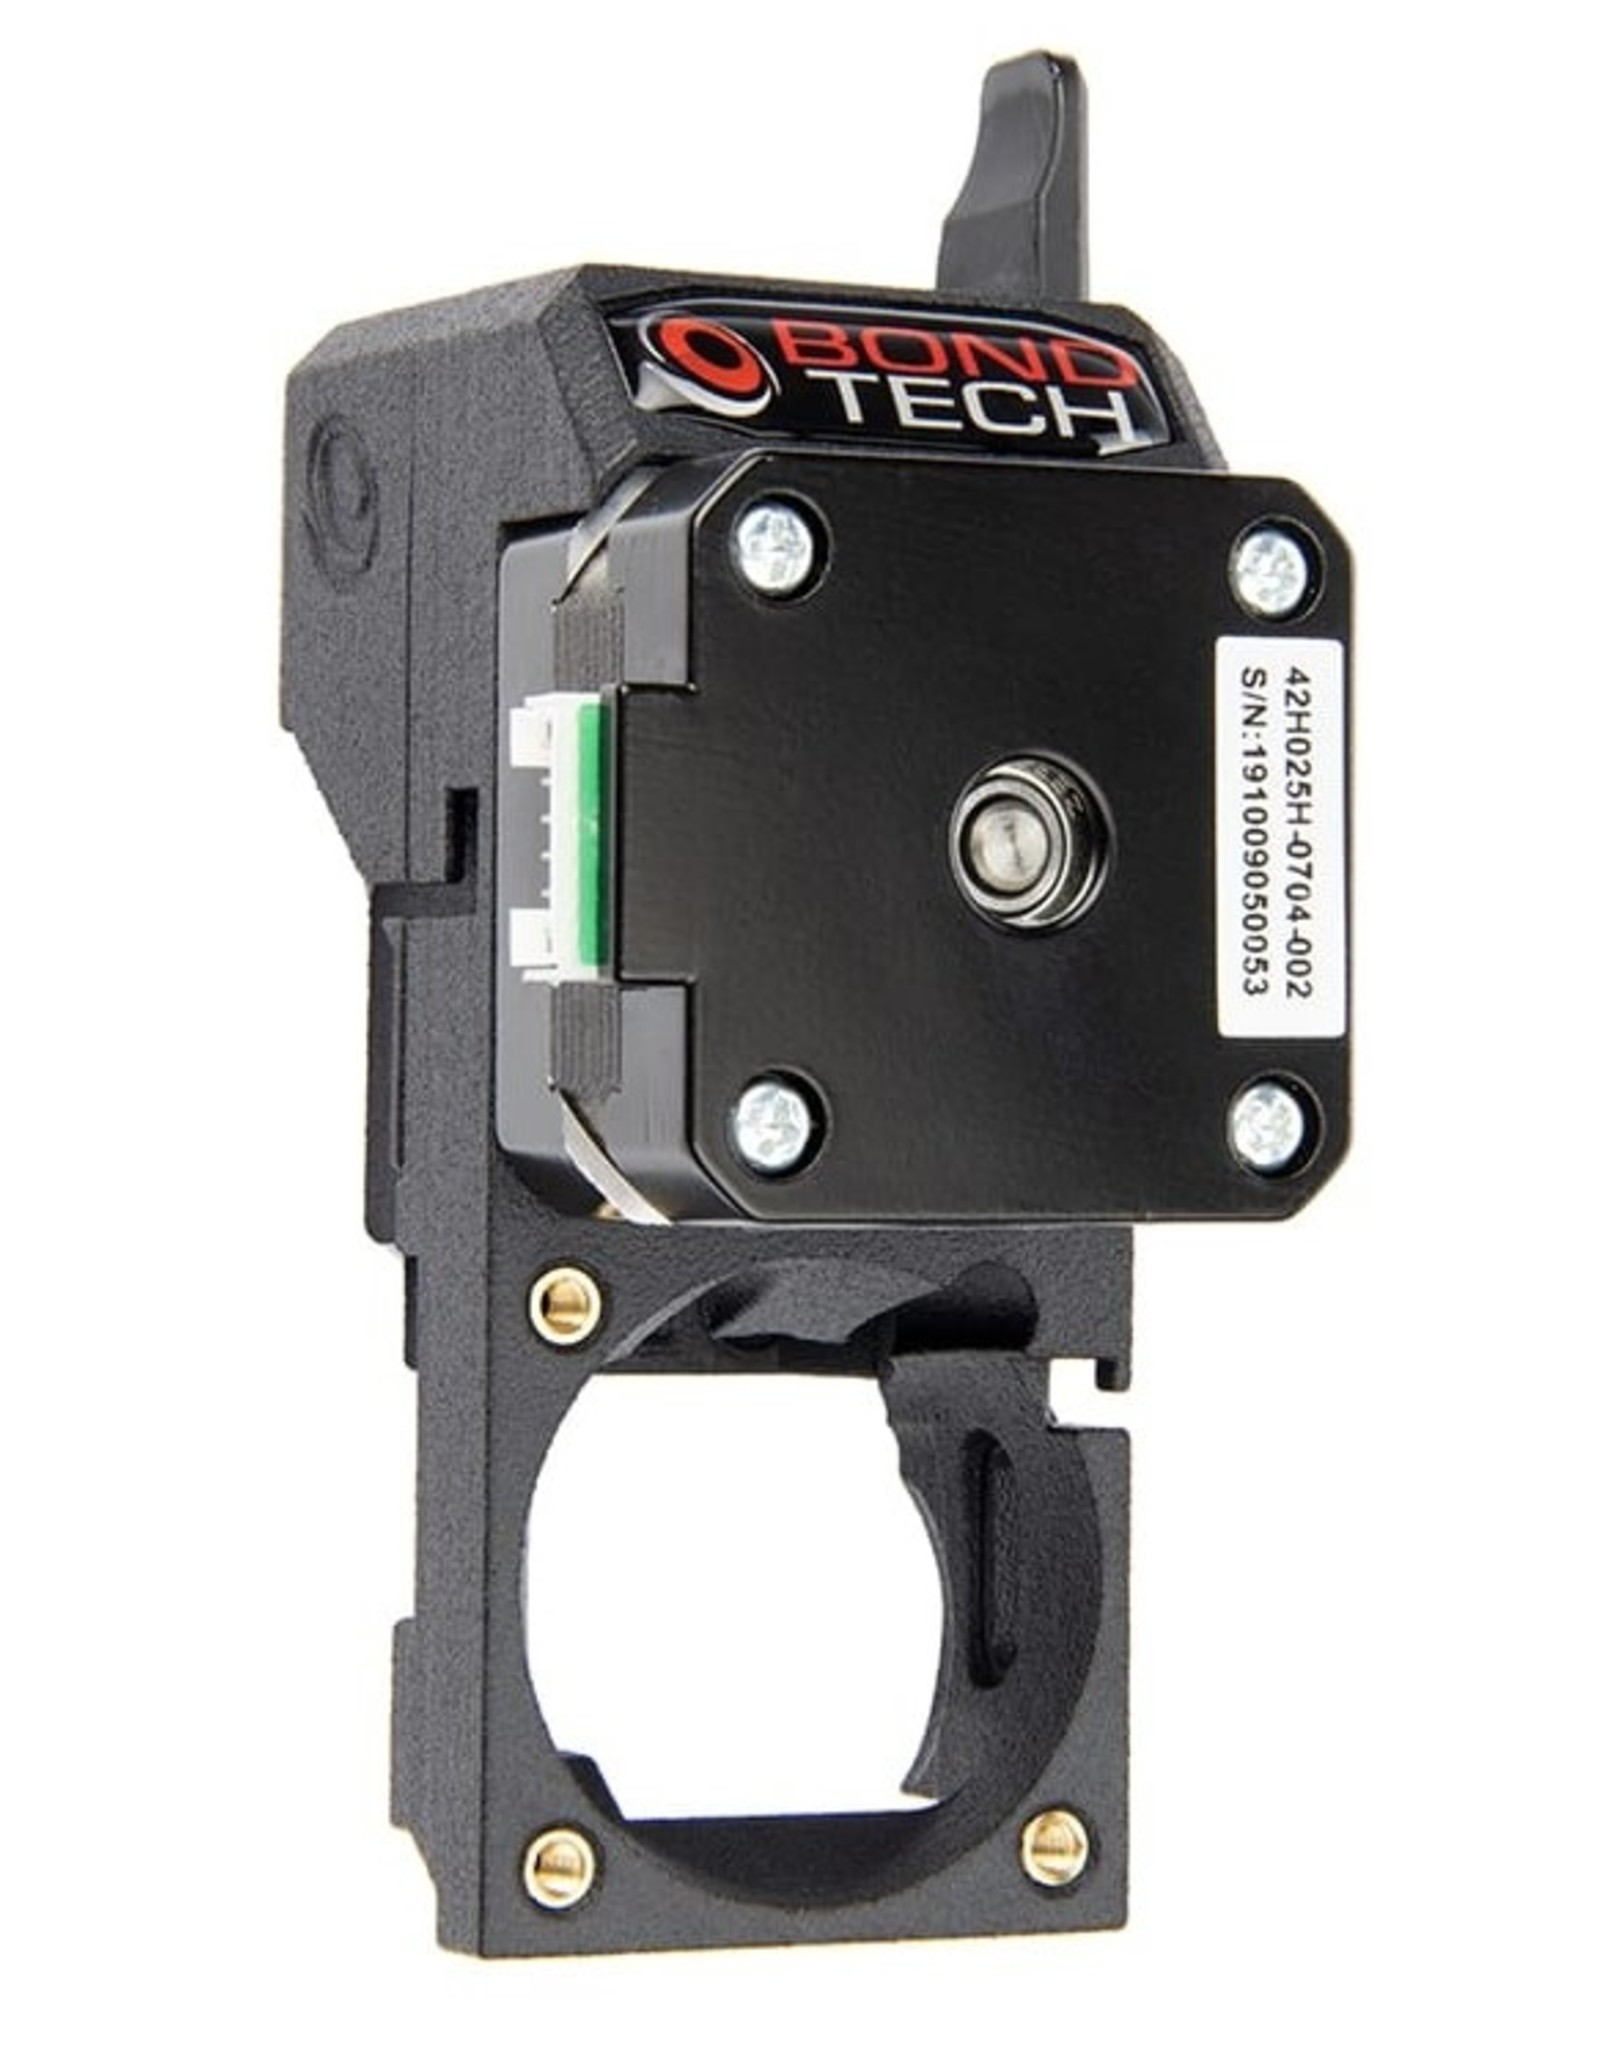 BONDTECH Bondtech DDX Direct Drive eXtruder voor Creality CR-10 Max/Pro printers